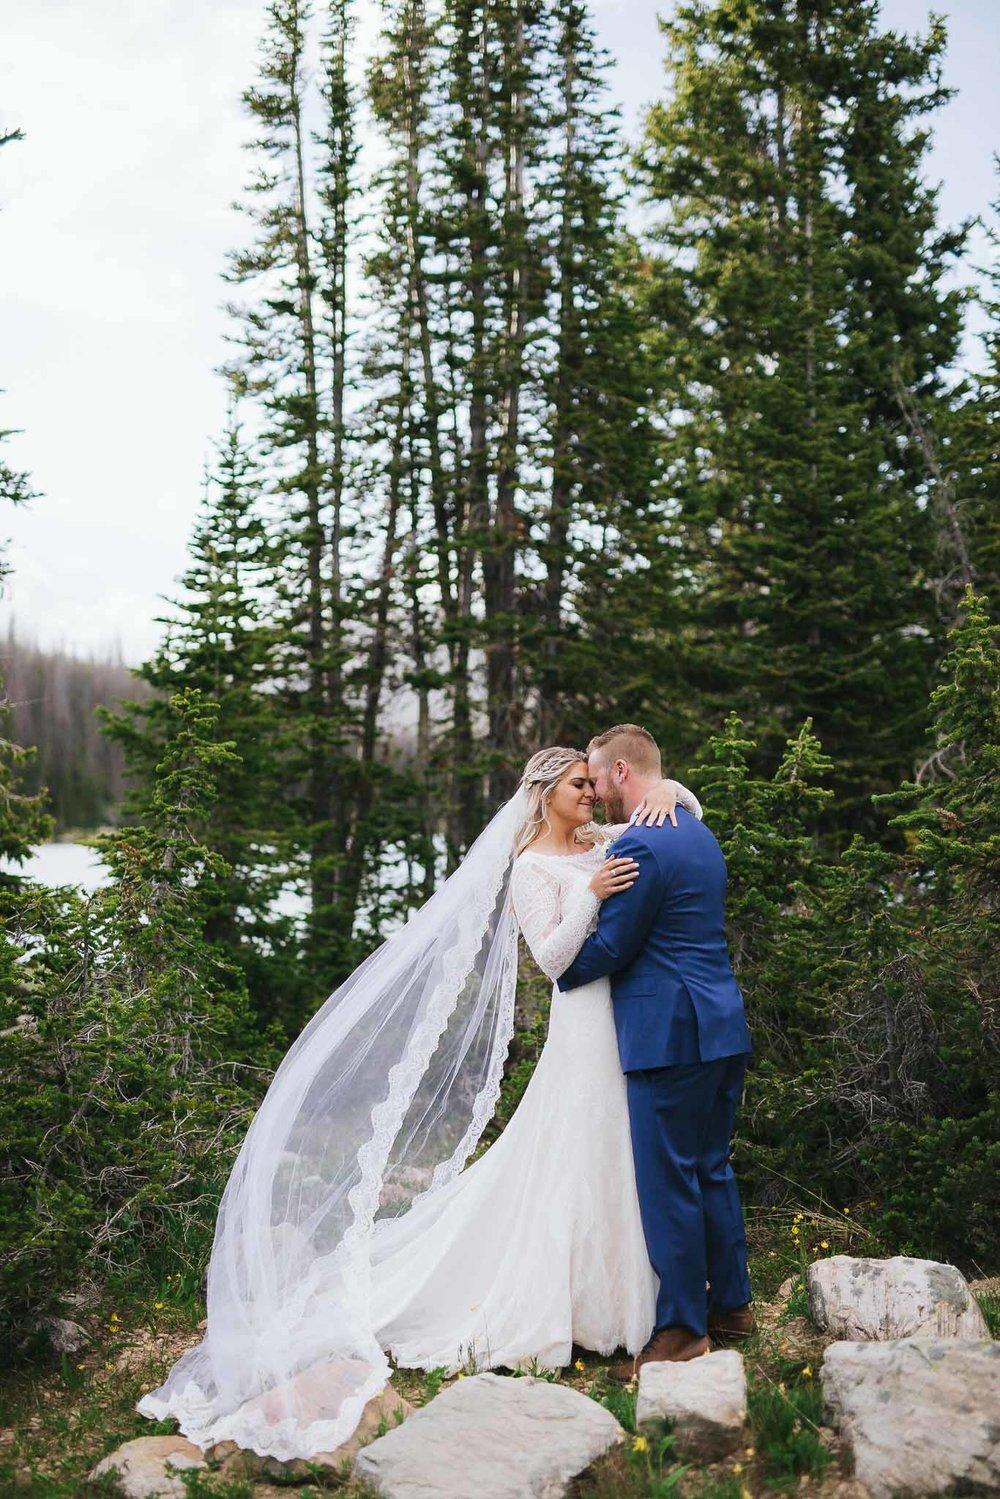 Wedding veil blows in wind while couple hug at Mirror Lake in Utah